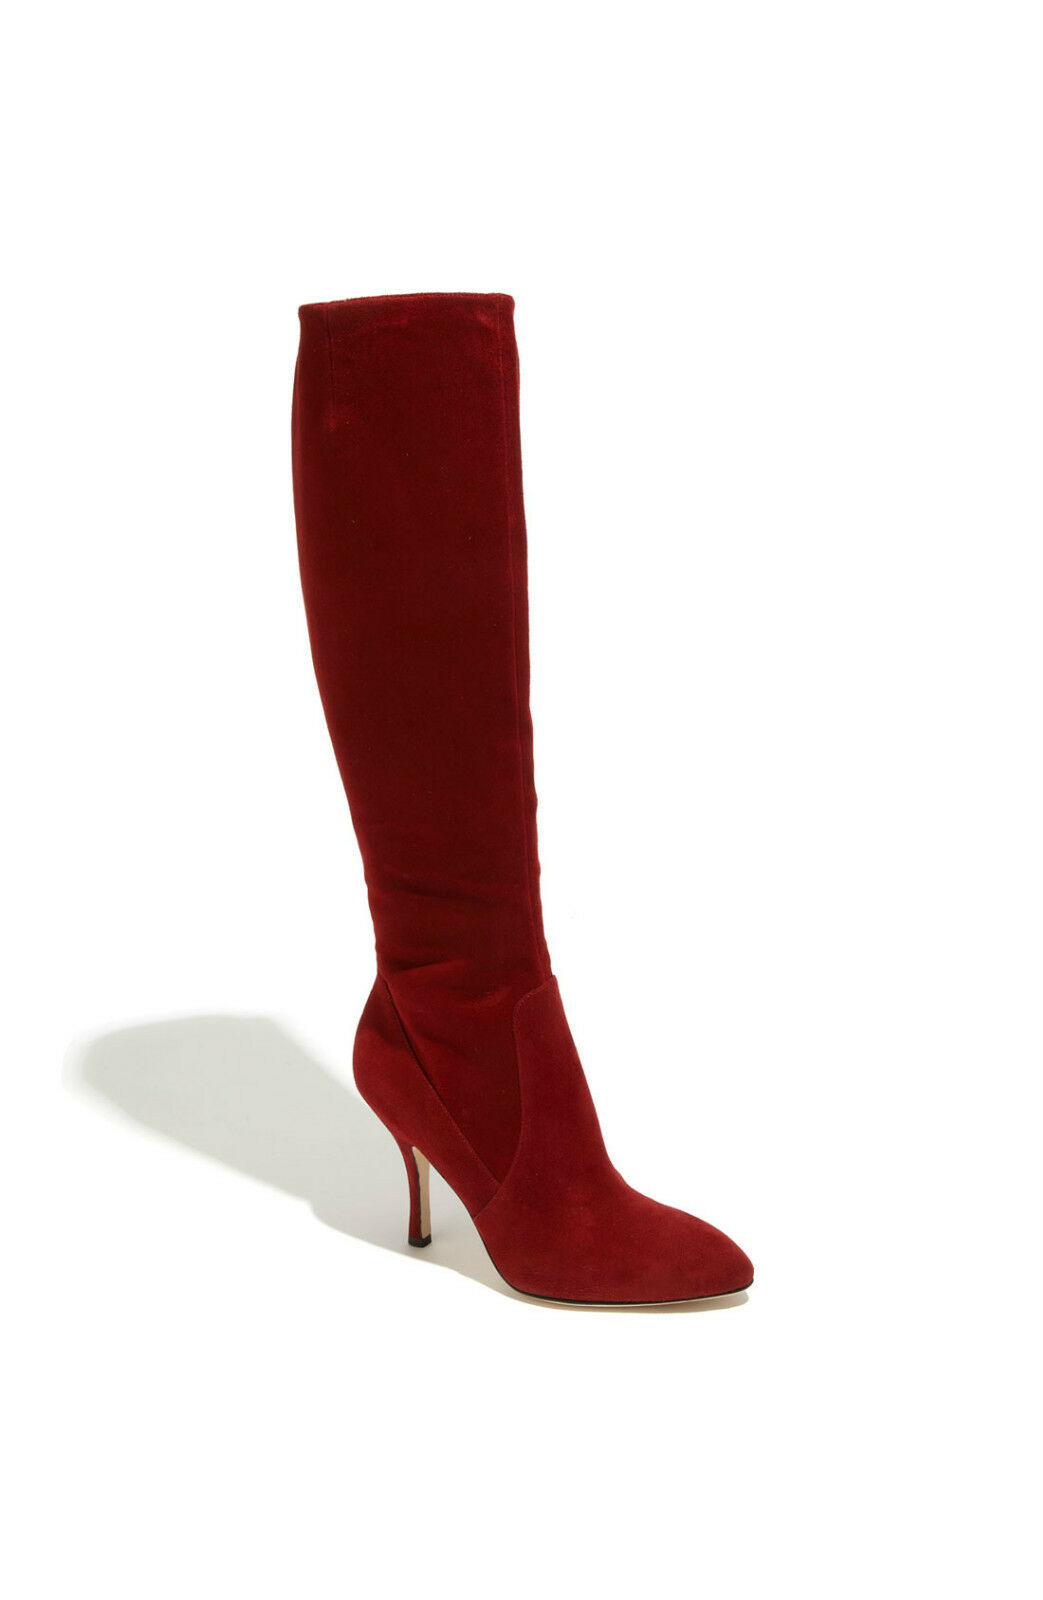 Via Spiga Piper Suede Knee High Boot Size 6